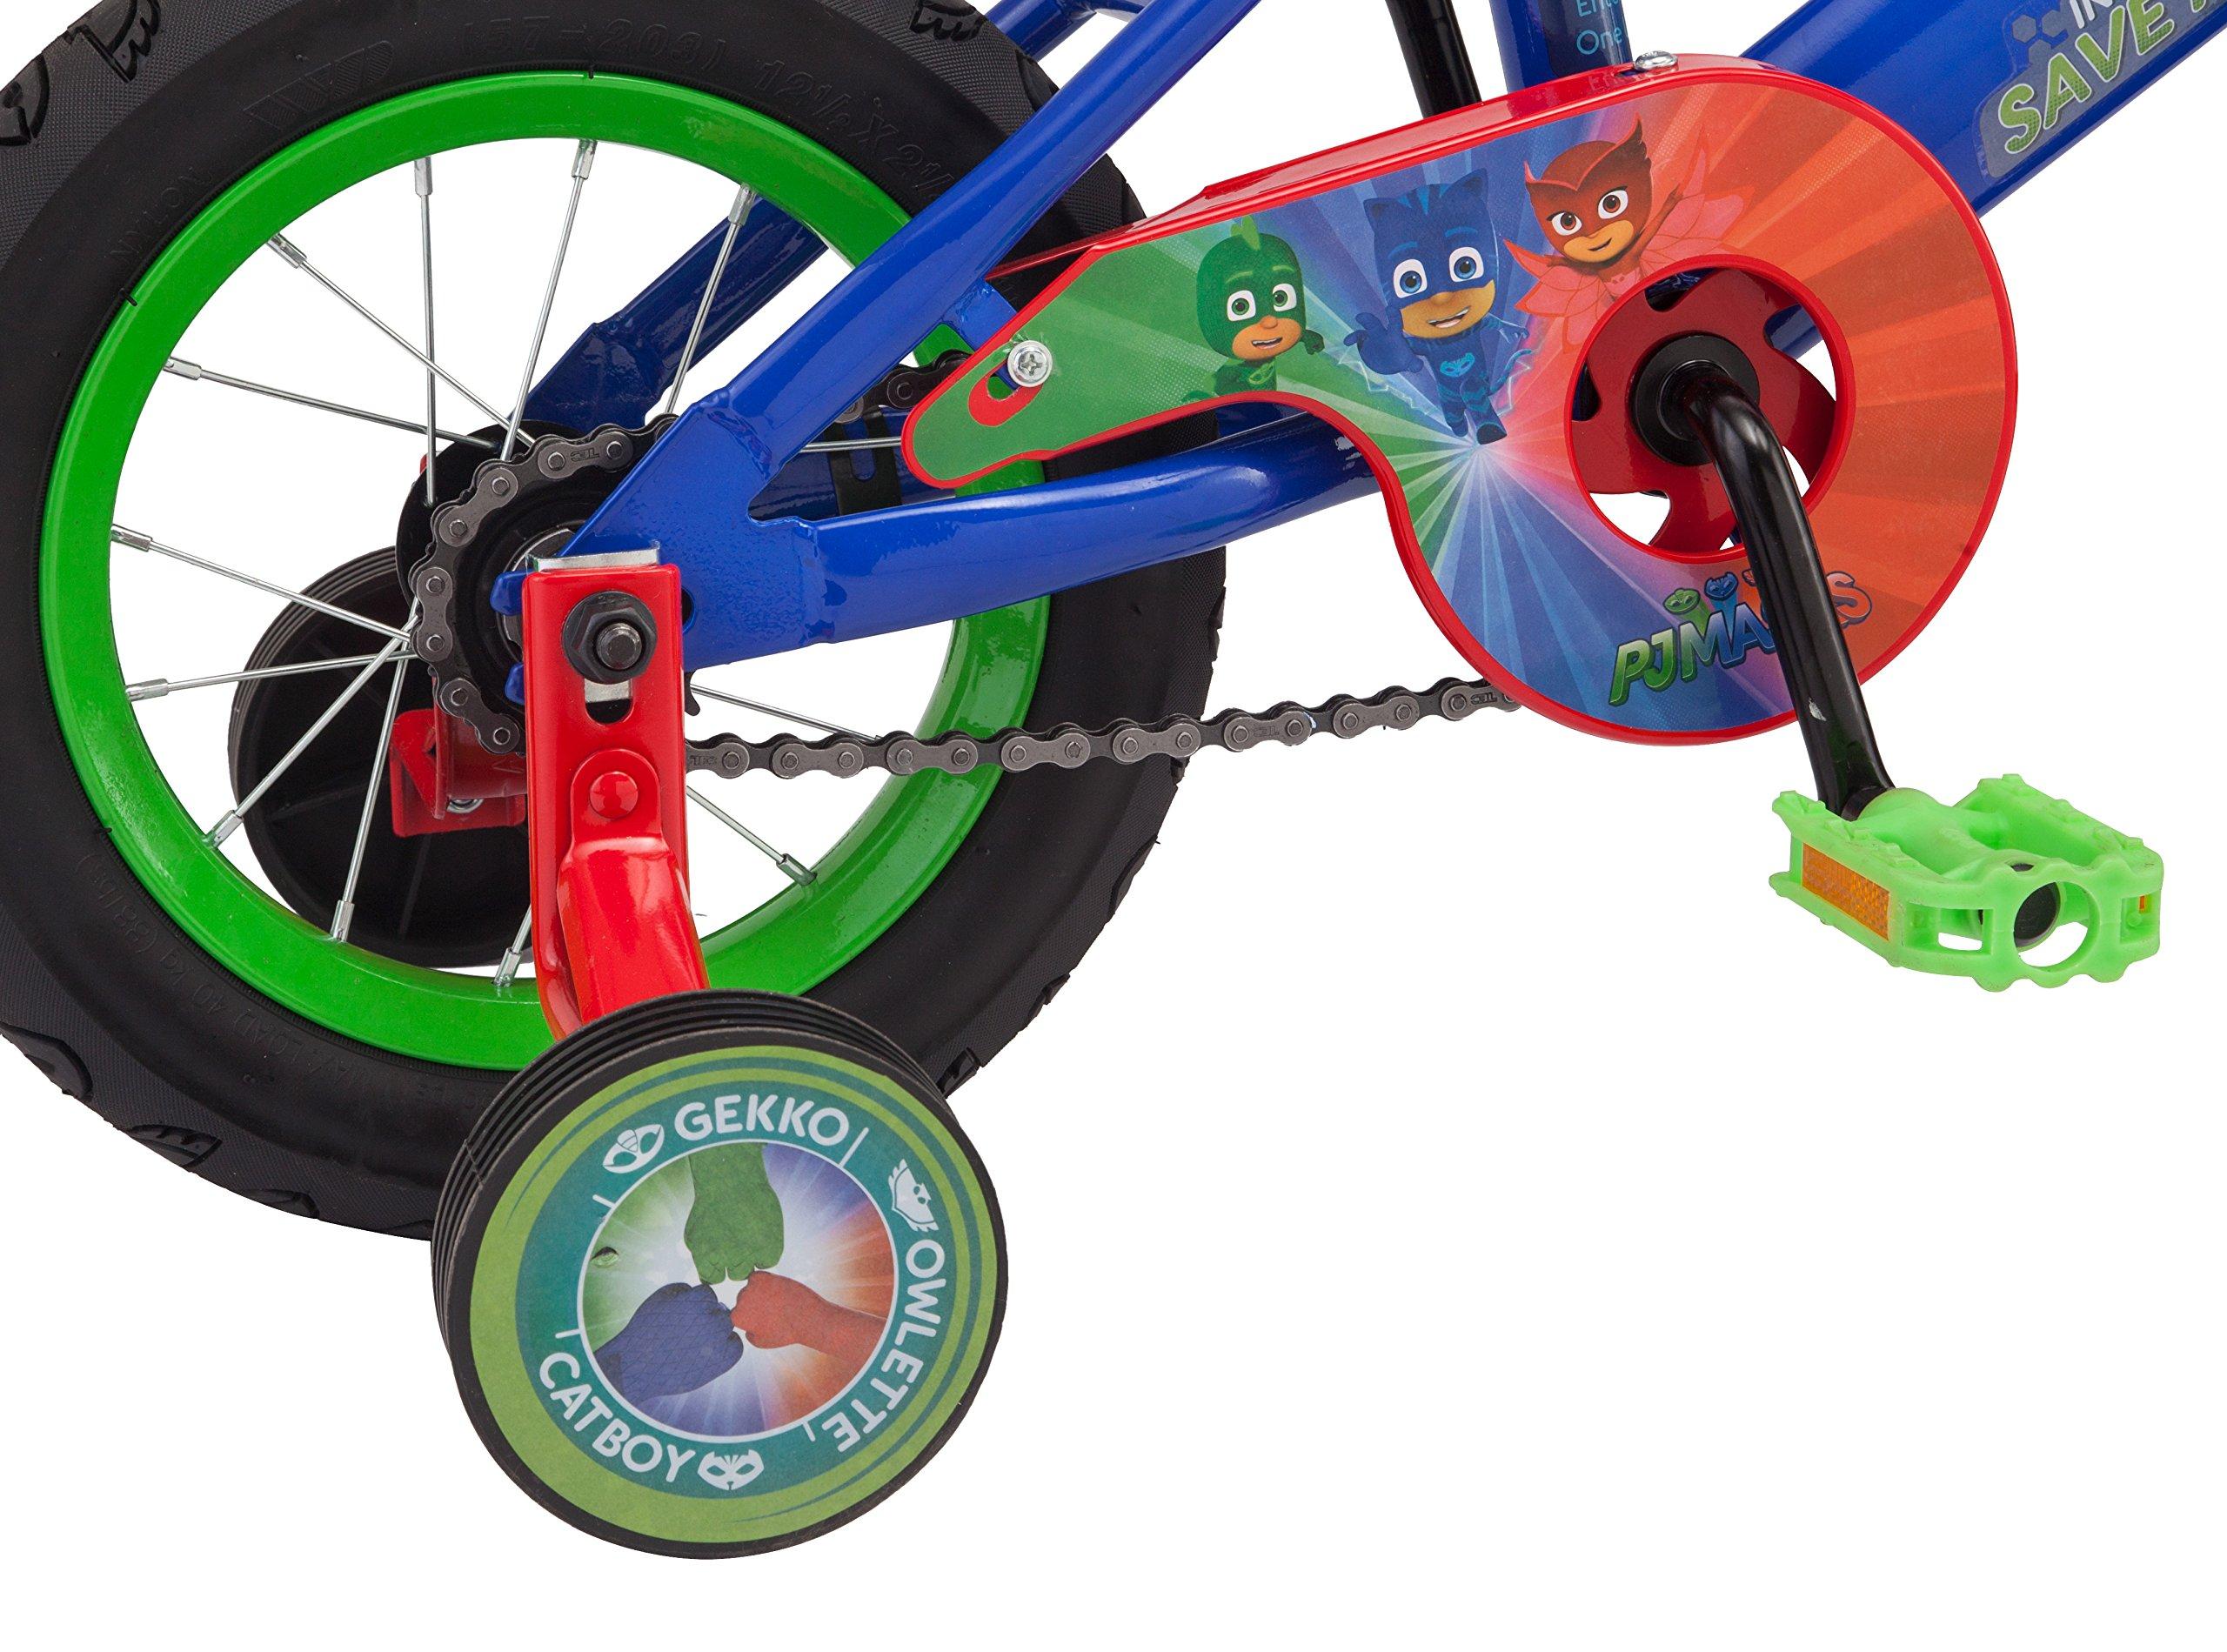 "PJ Masks Boy's 12"" Bicycle, Blue by PJMASKS (Image #5)"